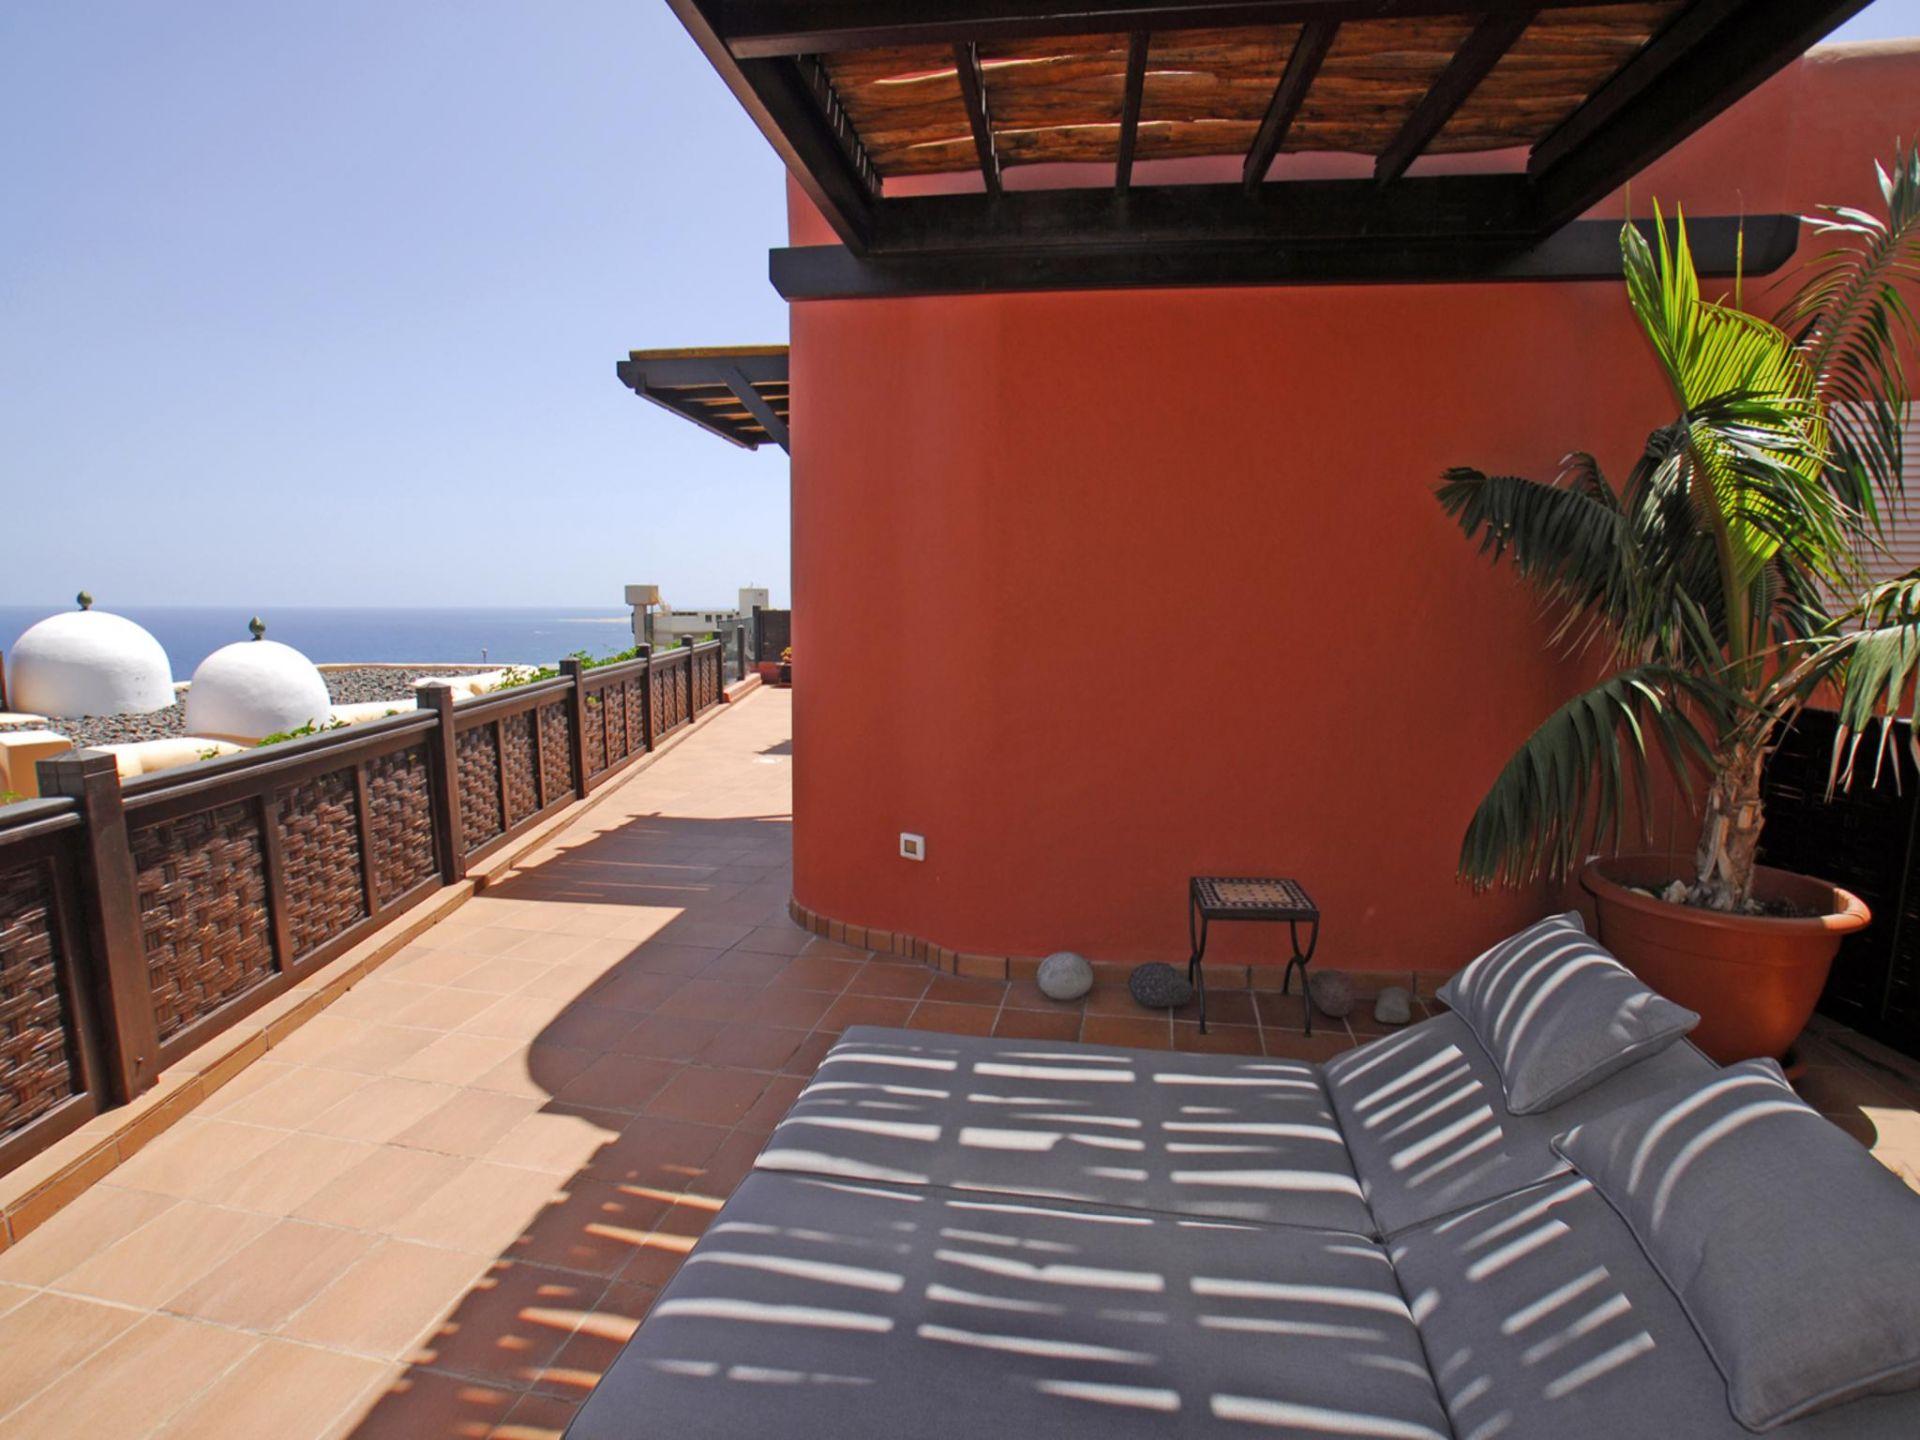 Holiday apartment Villa San Agustin 10 - Holiday Rental (854295), Maspalomas, Gran Canaria, Canary Islands, Spain, picture 9